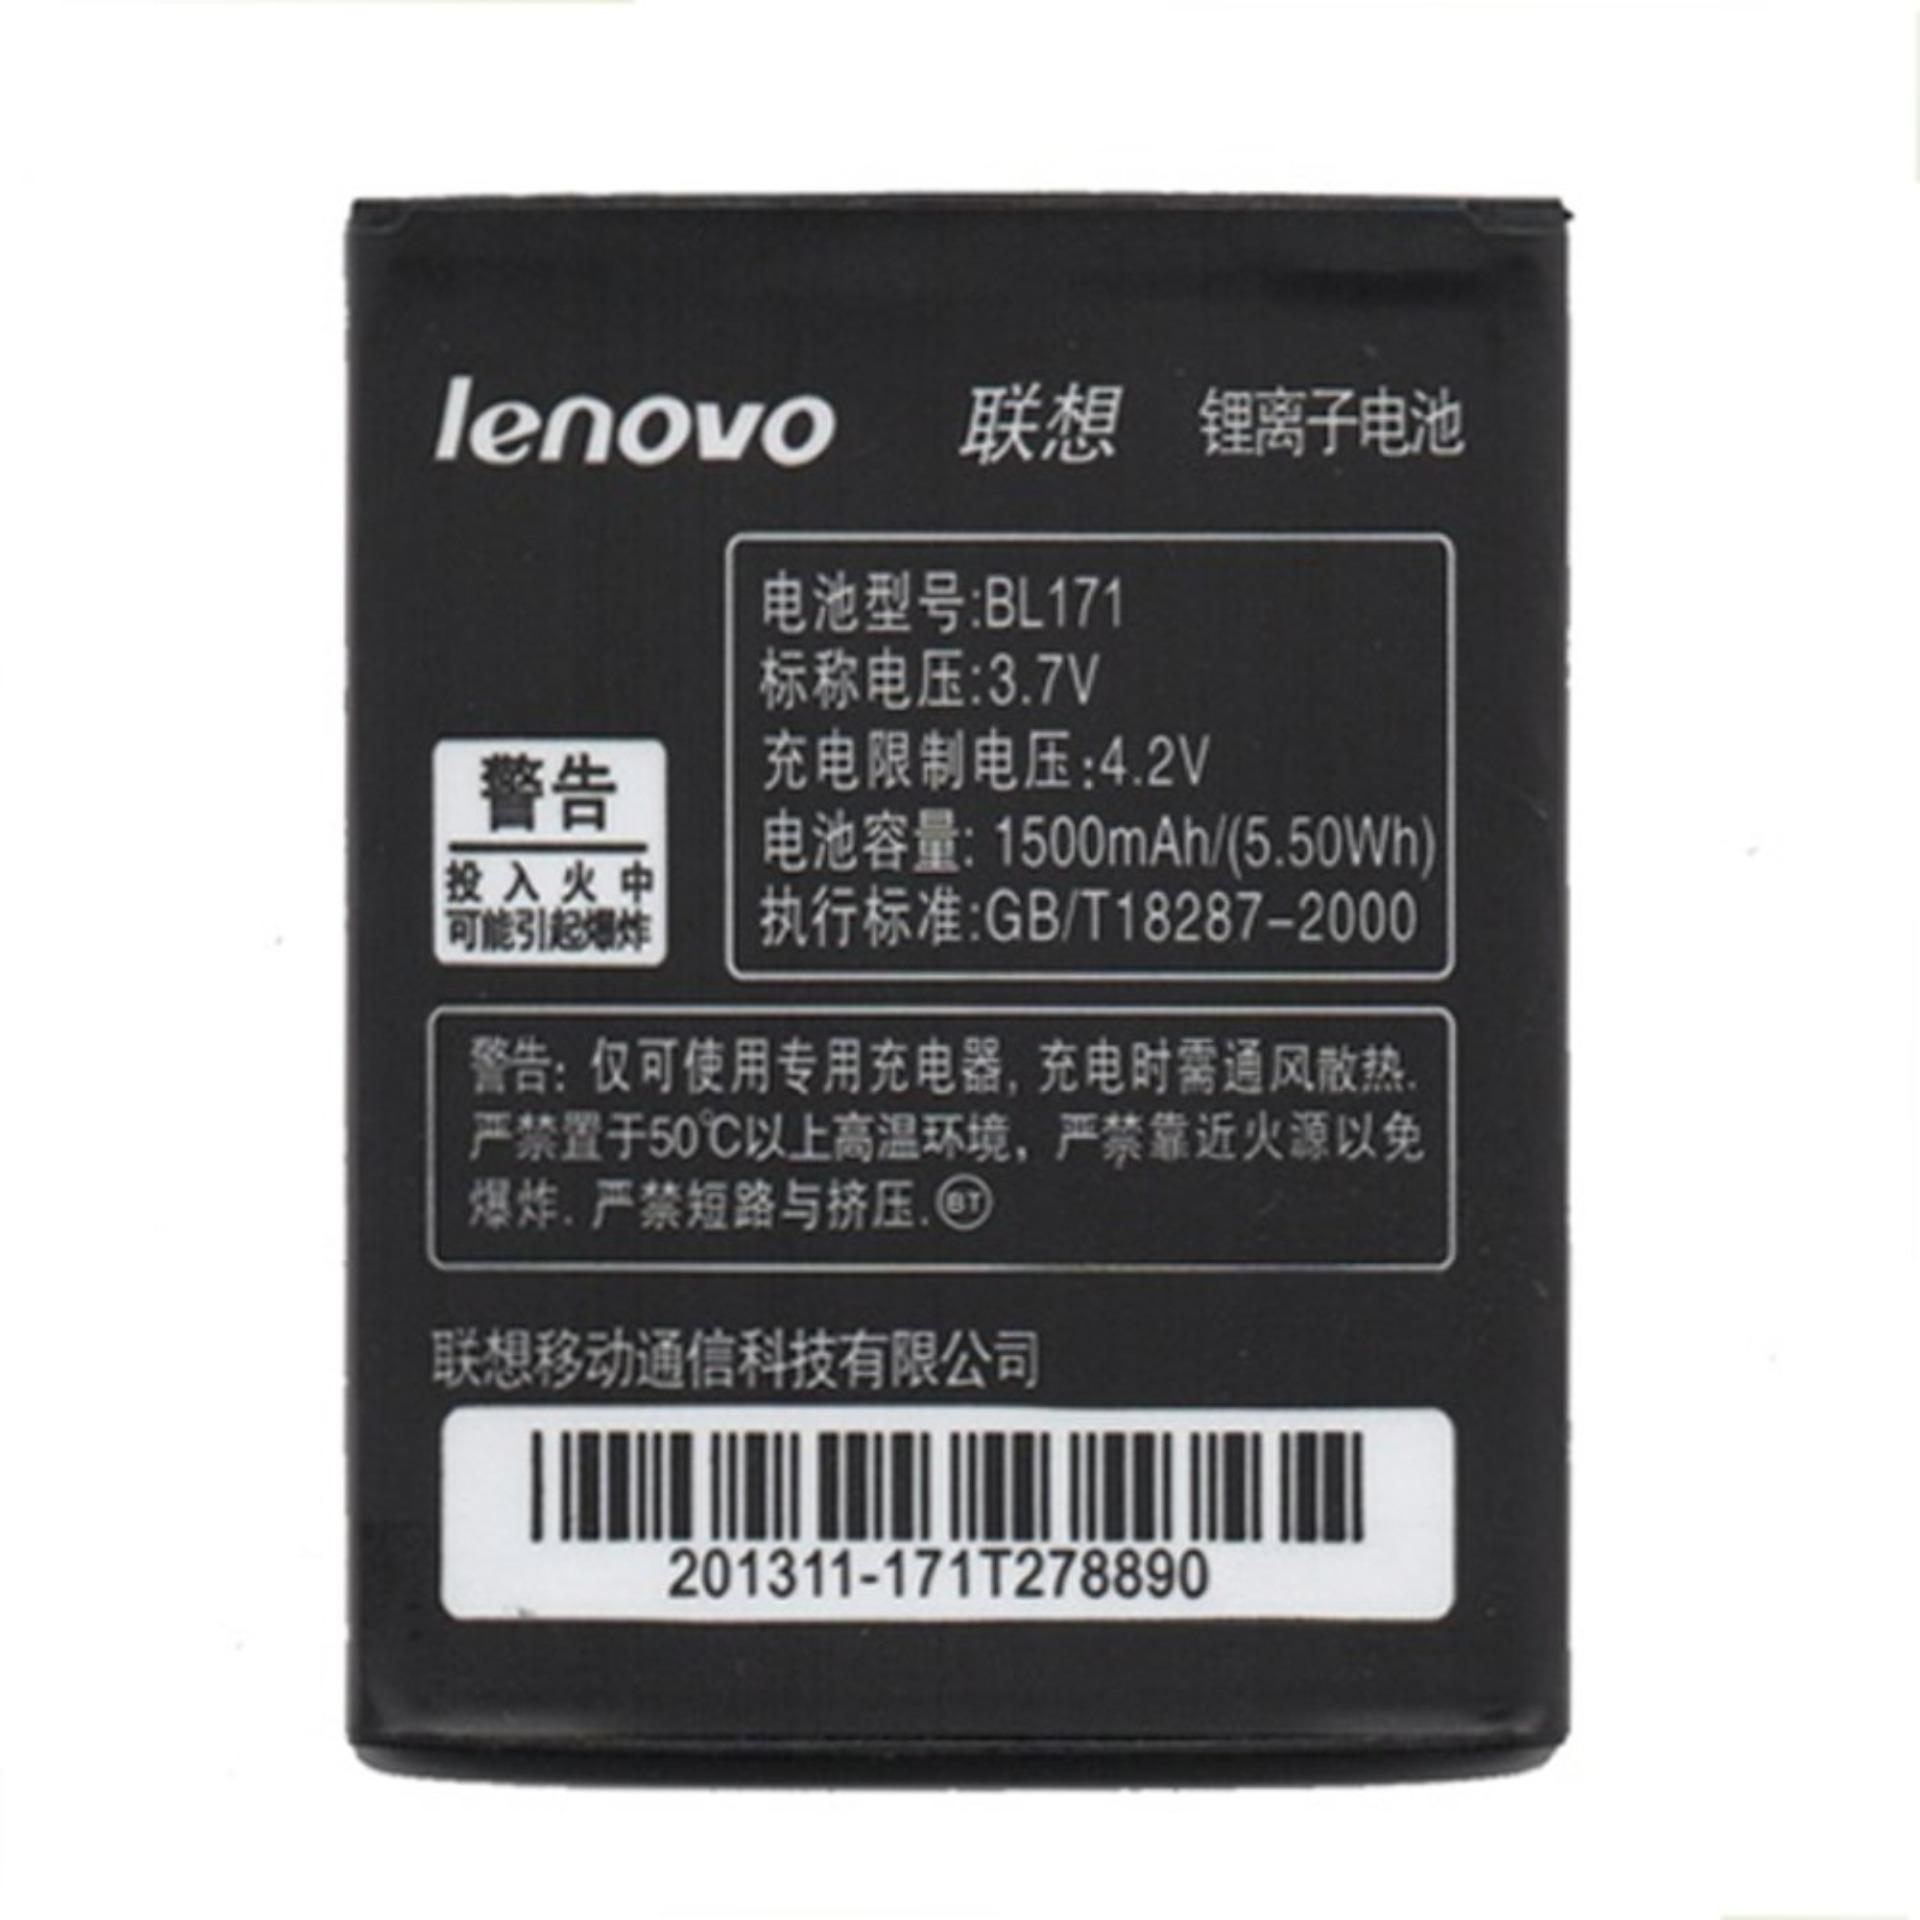 Beli Lenovo 100 Store Marwanto606 Charger C P36 2a Original Baterai For Bl171 A390 A319